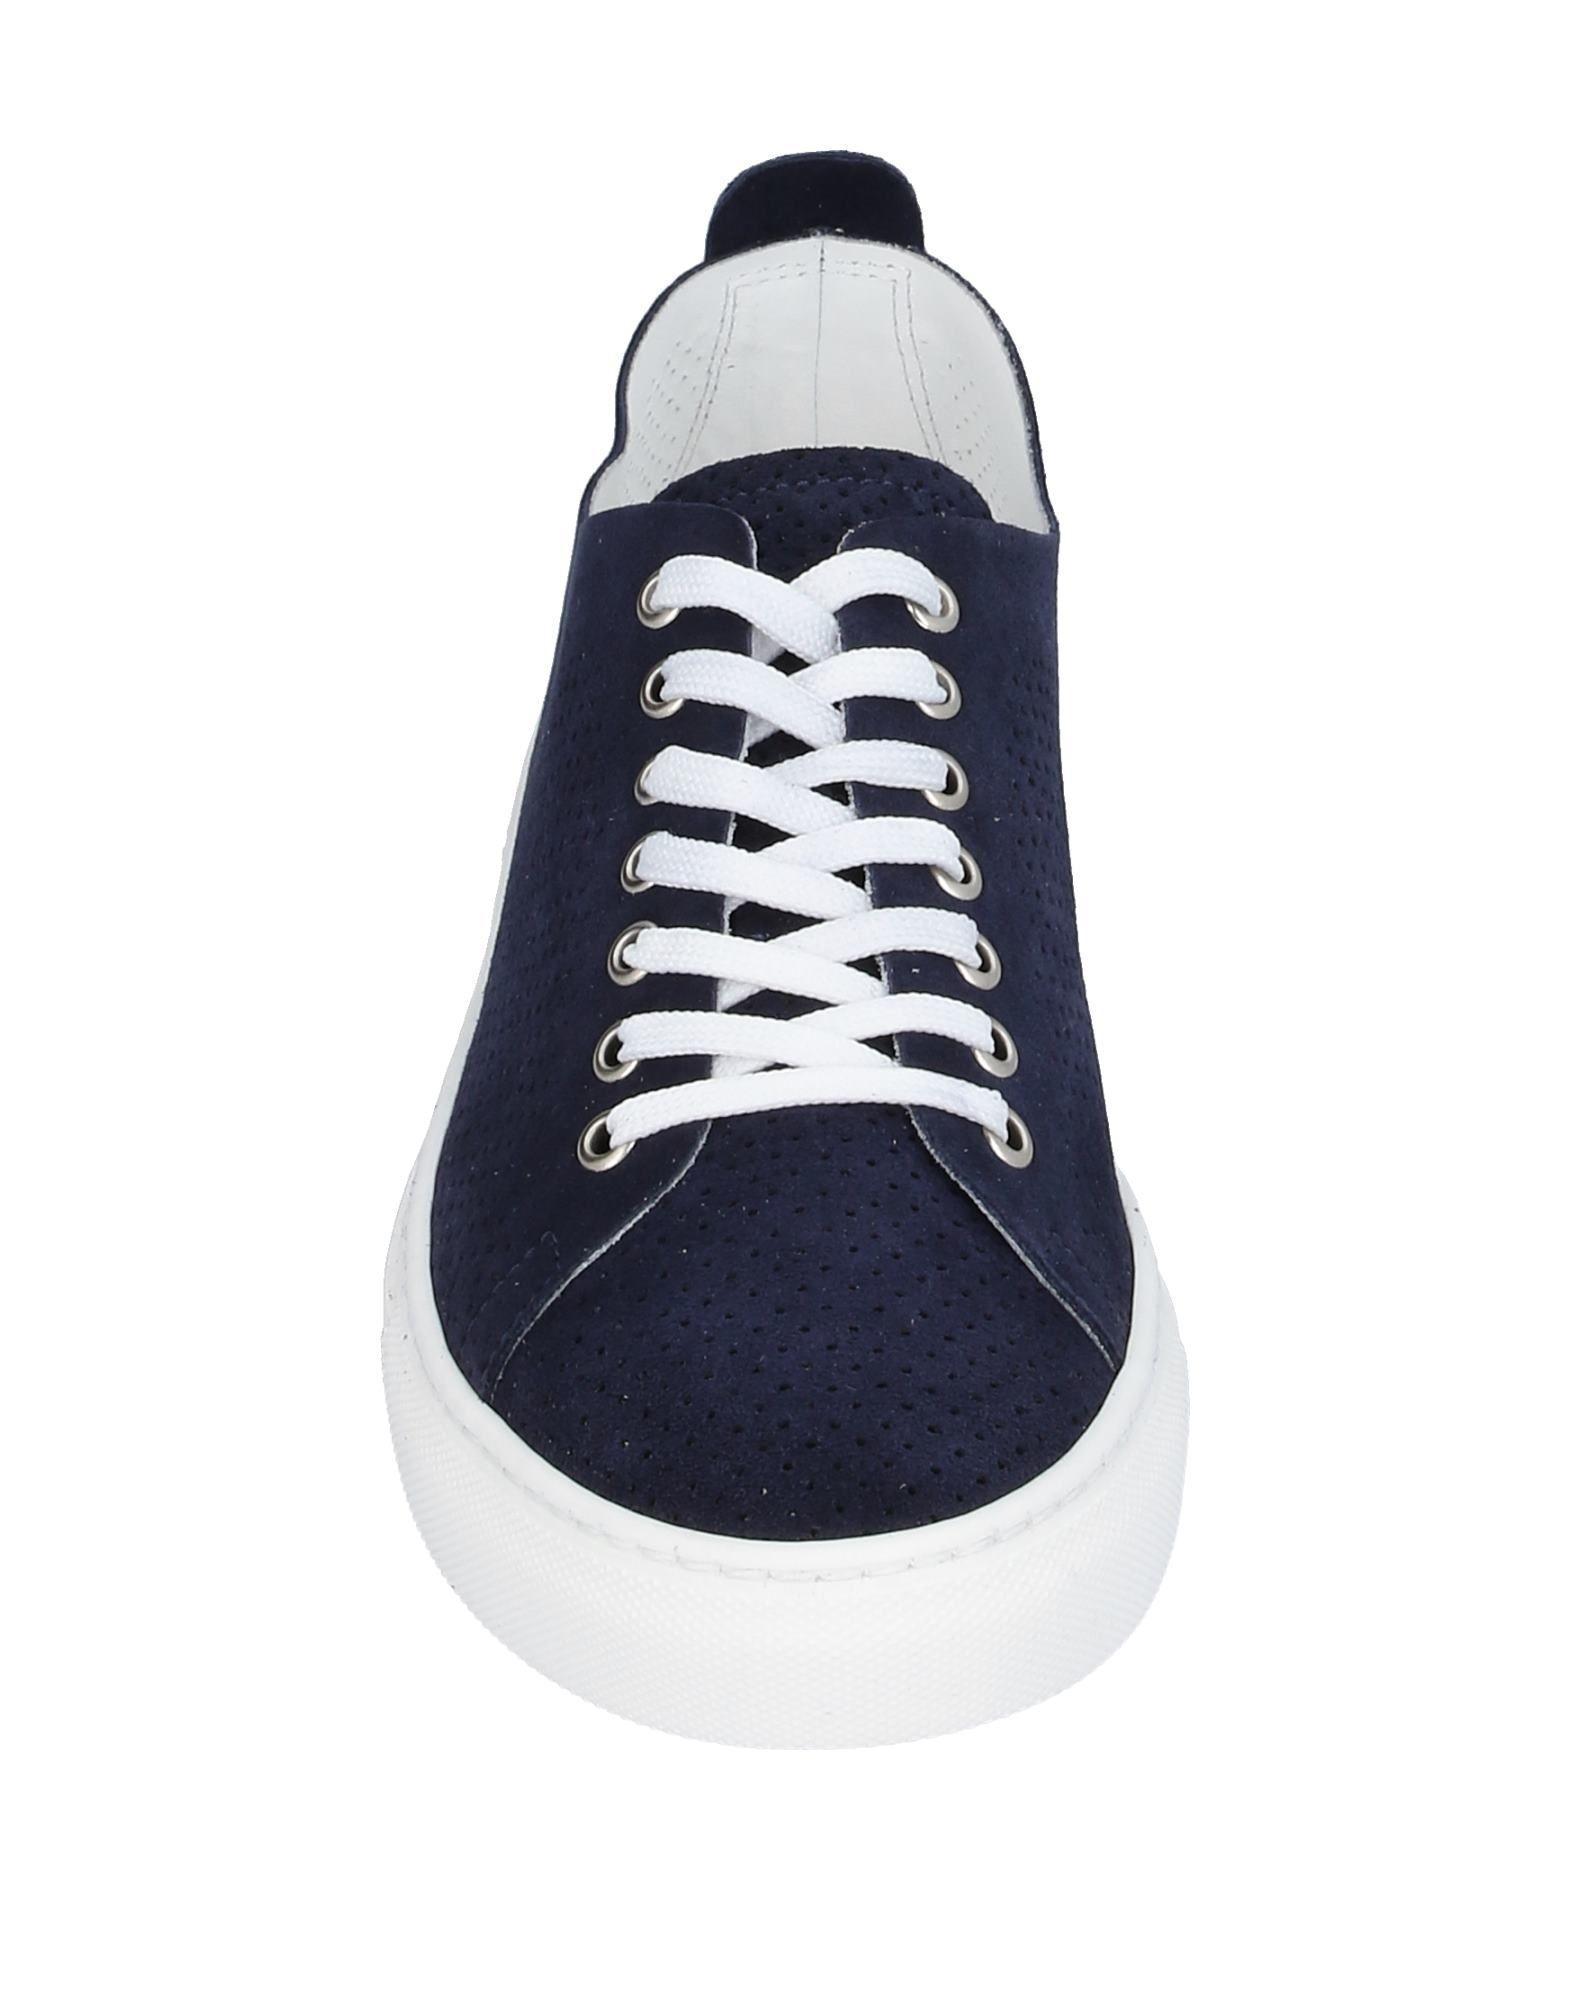 Sneakers & Tennis basses Cuir Minoronzoni 1953 pour homme en coloris Bleu Uiia